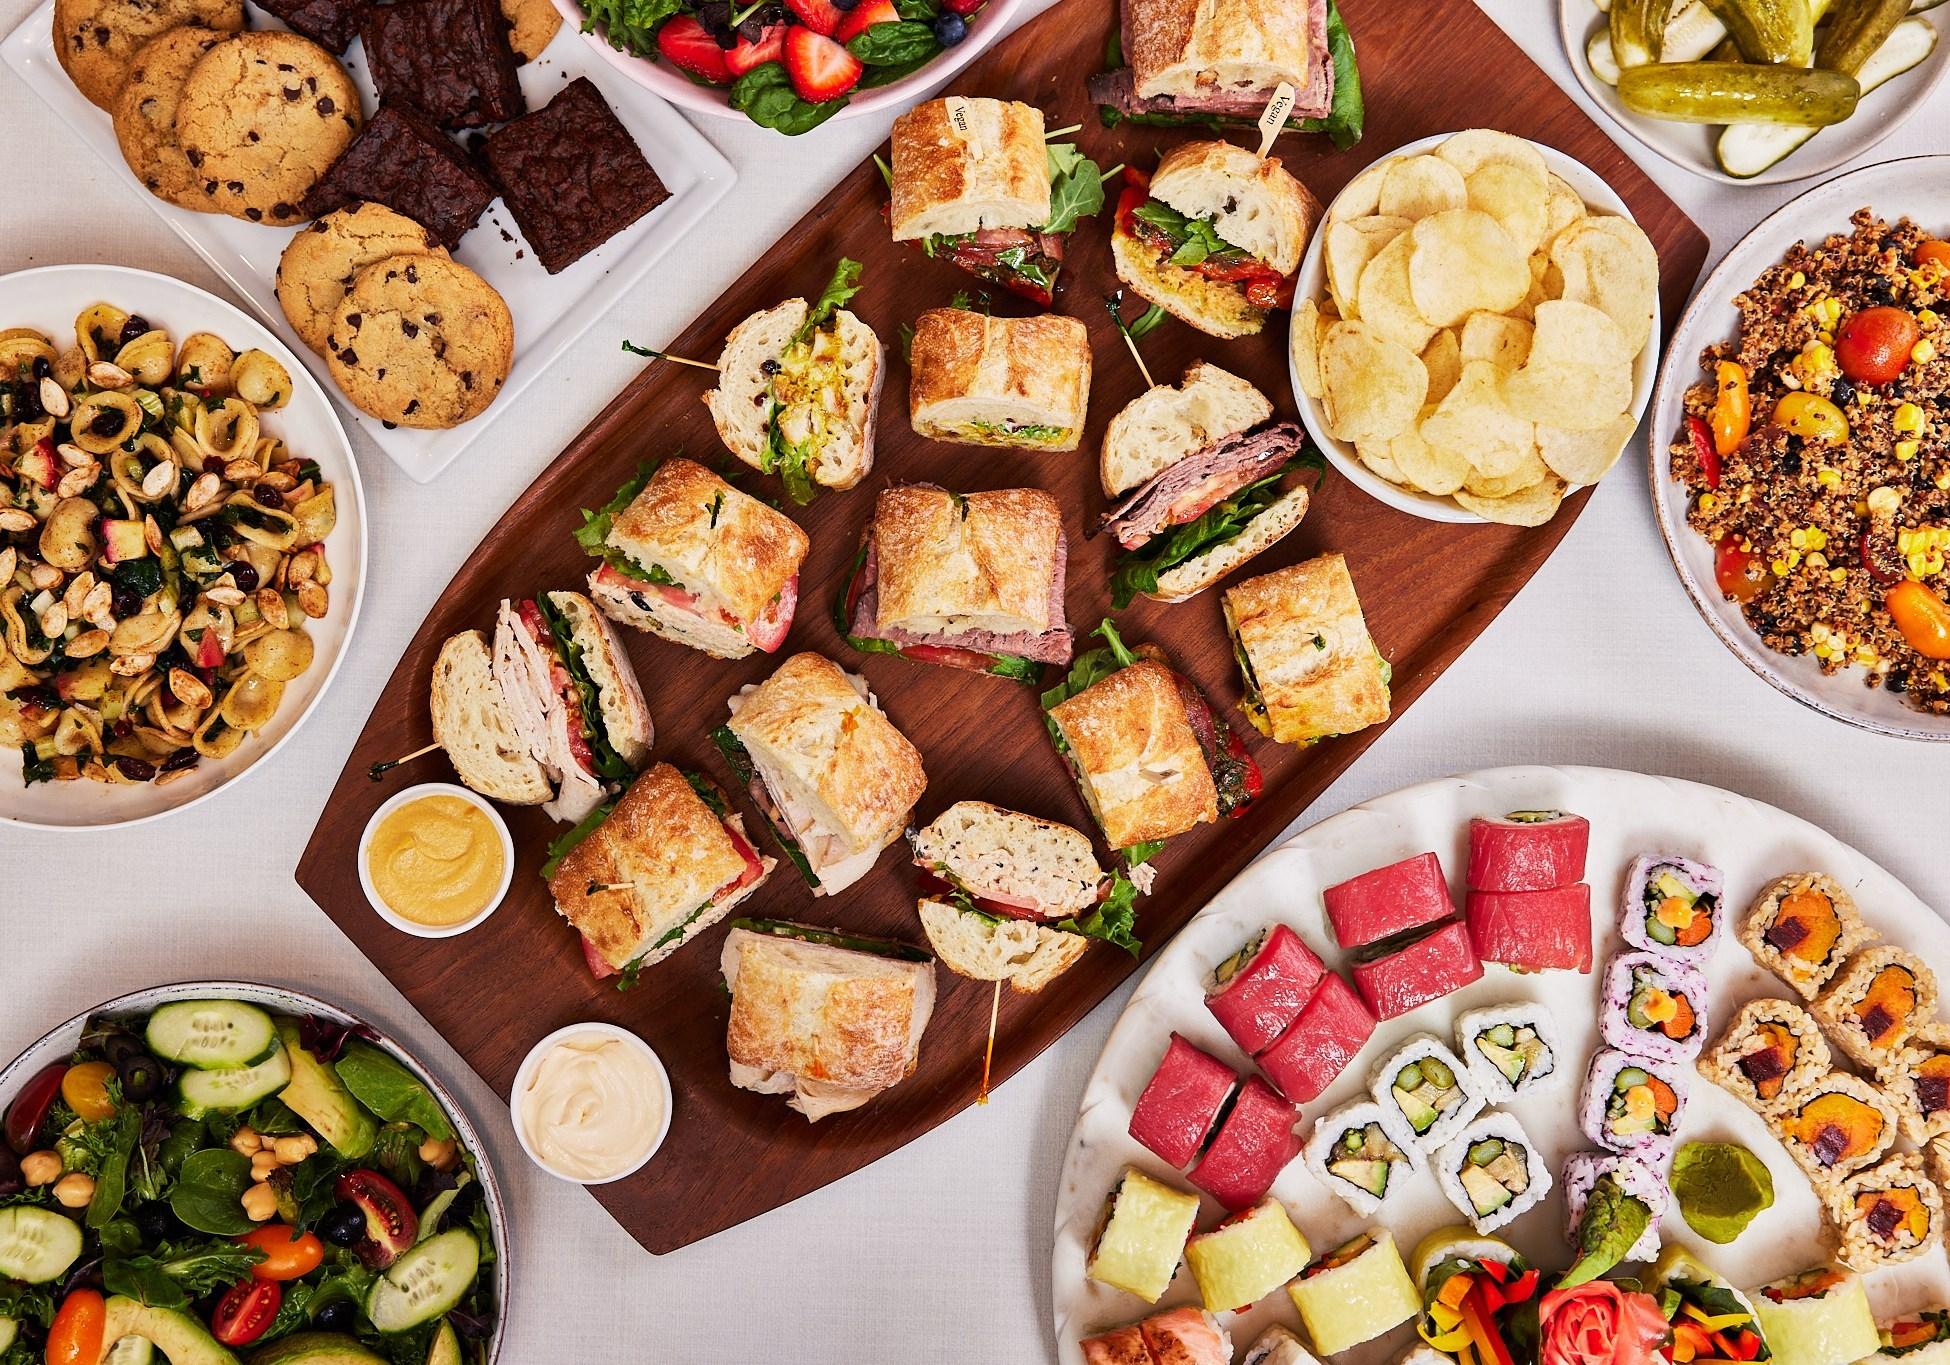 Boston Common Sushi & Sandwich Package - Vegetarian & Fish Medium